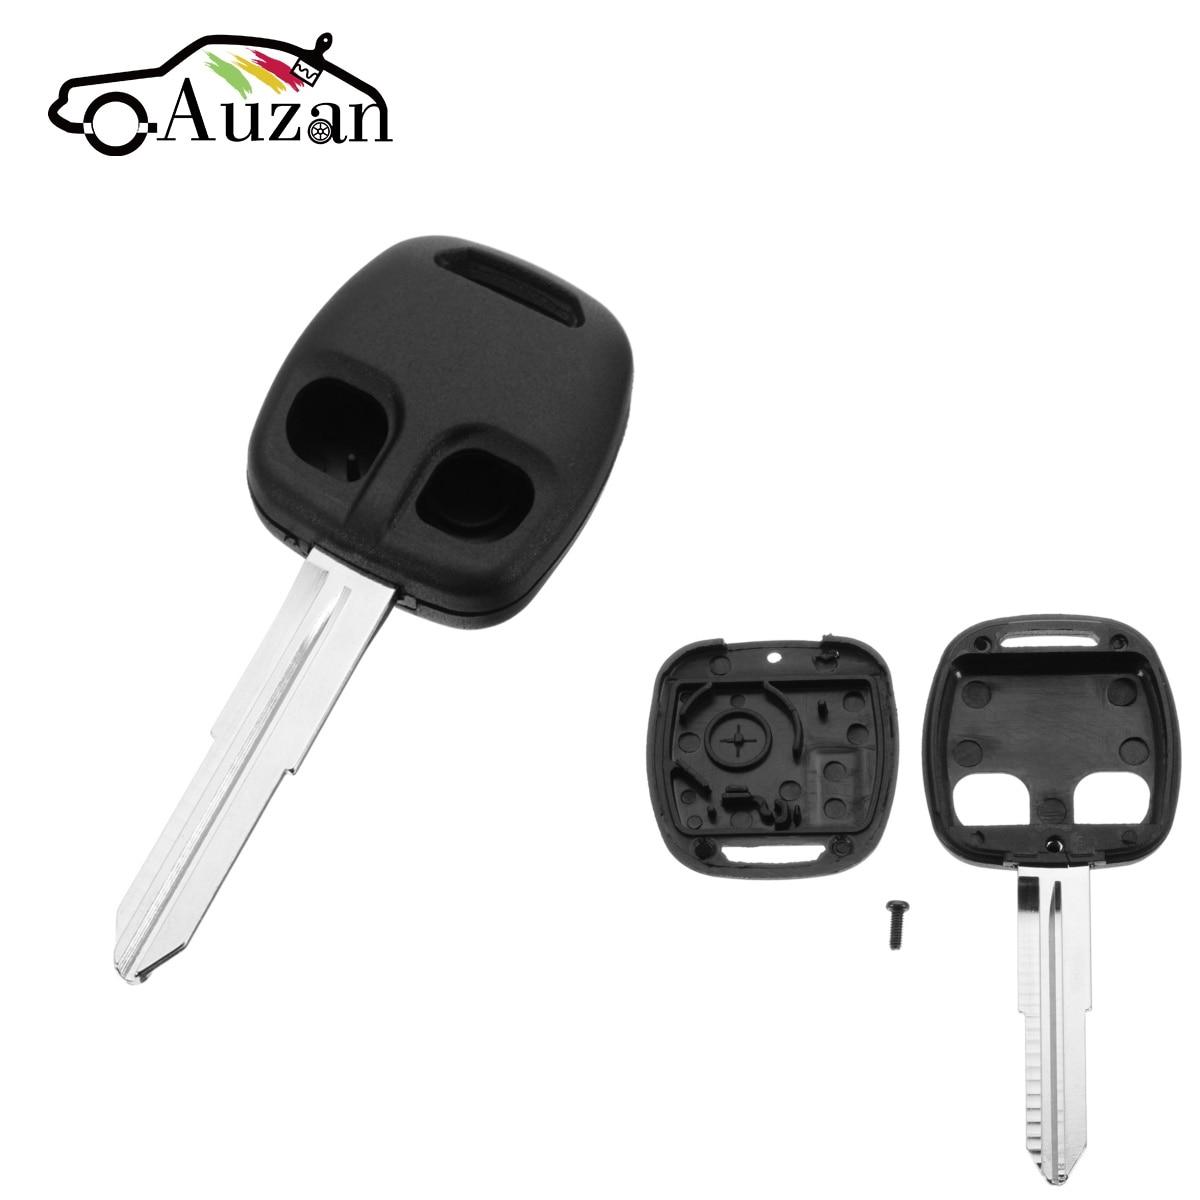 2 кнопки корпус автомобильного ключа дистанционного управления MIT11R лезвие чехол Fob для MITSUBISHI Lancer Evo L200 Shogun Pajero замена ключа